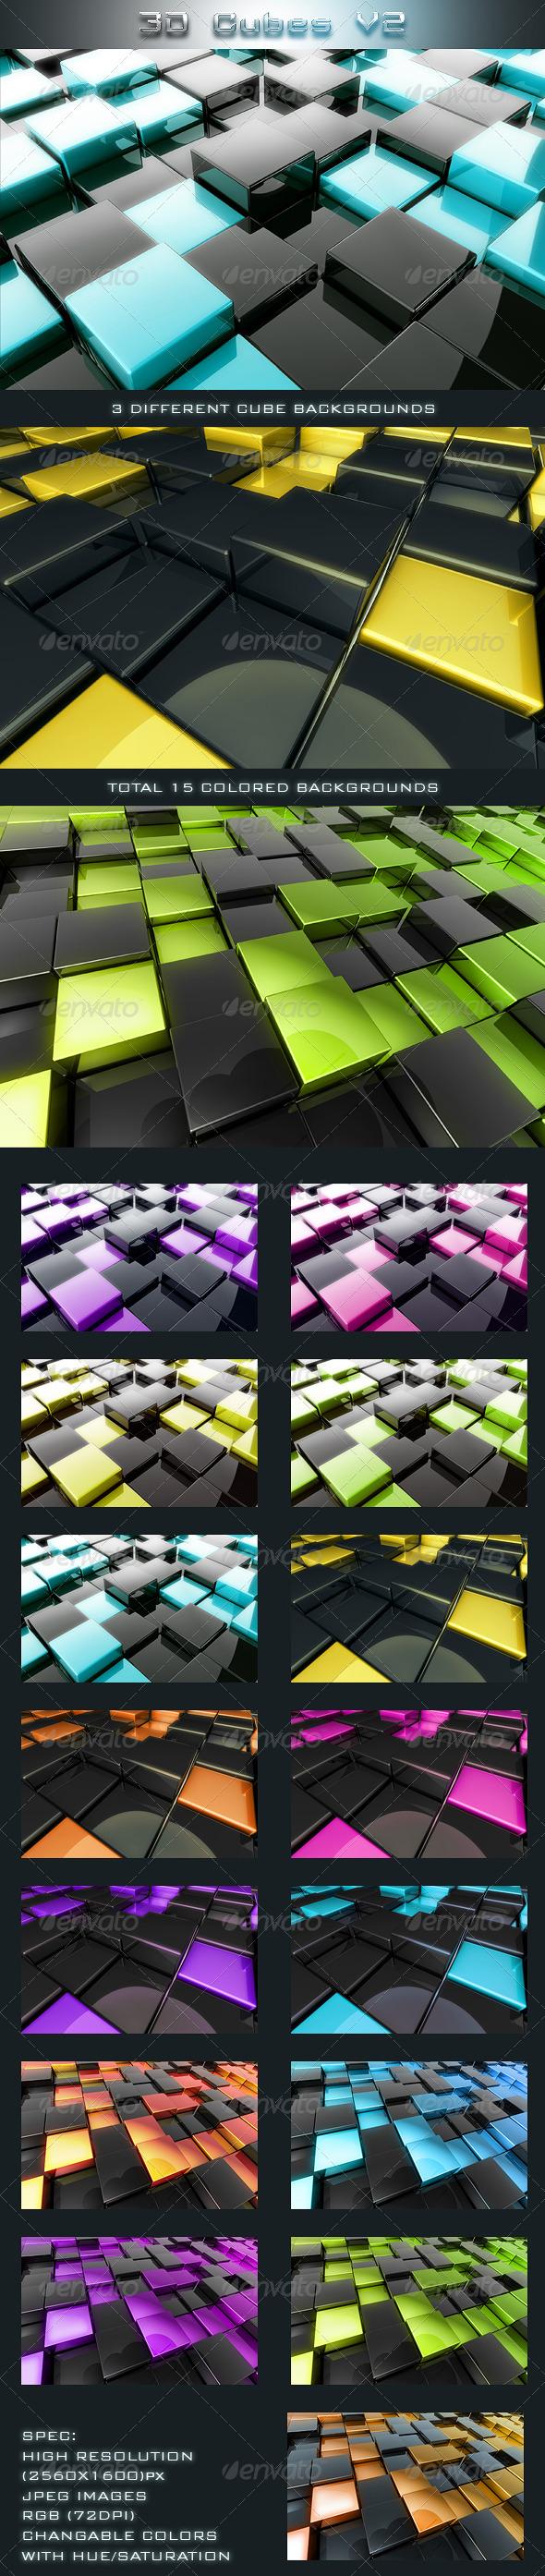 GraphicRiver 3D Cubes V2 2228563